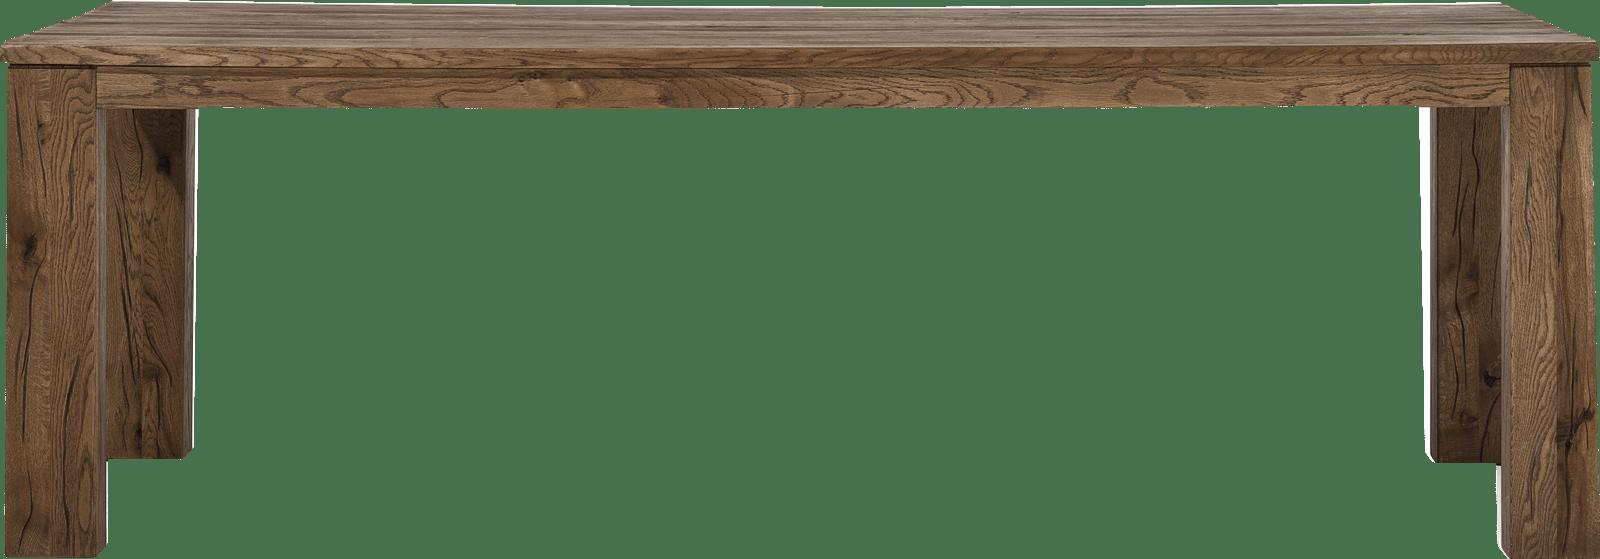 Masters - eetkamertafel 240 x 100 - hout 12x12/10x14